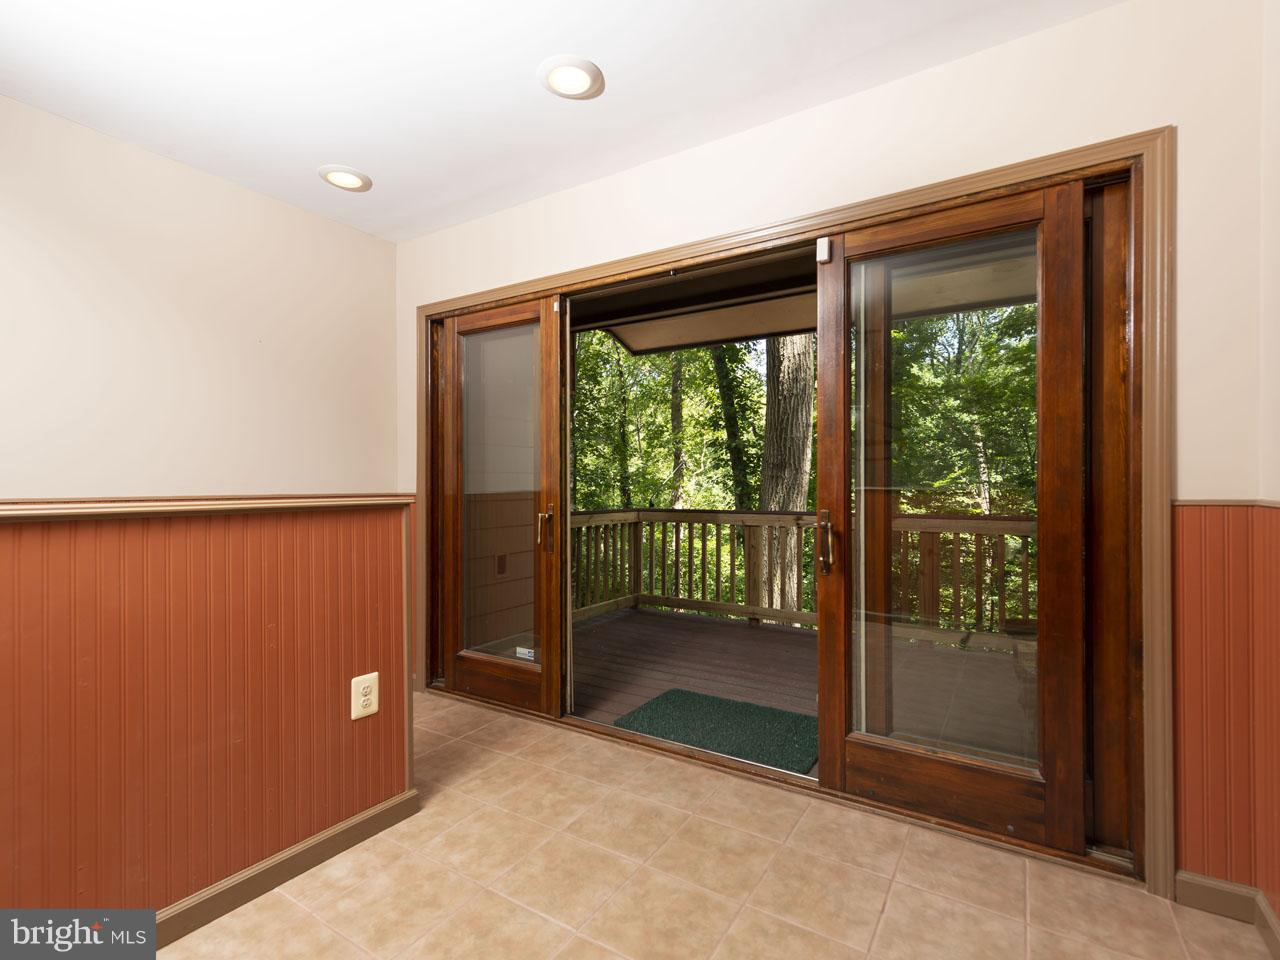 1002303700-300502418976-2021-07-22-03-27-23  |   | Alexandria Delaware Real Estate For Sale | MLS# 1002303700  - Best of Northern Virginia